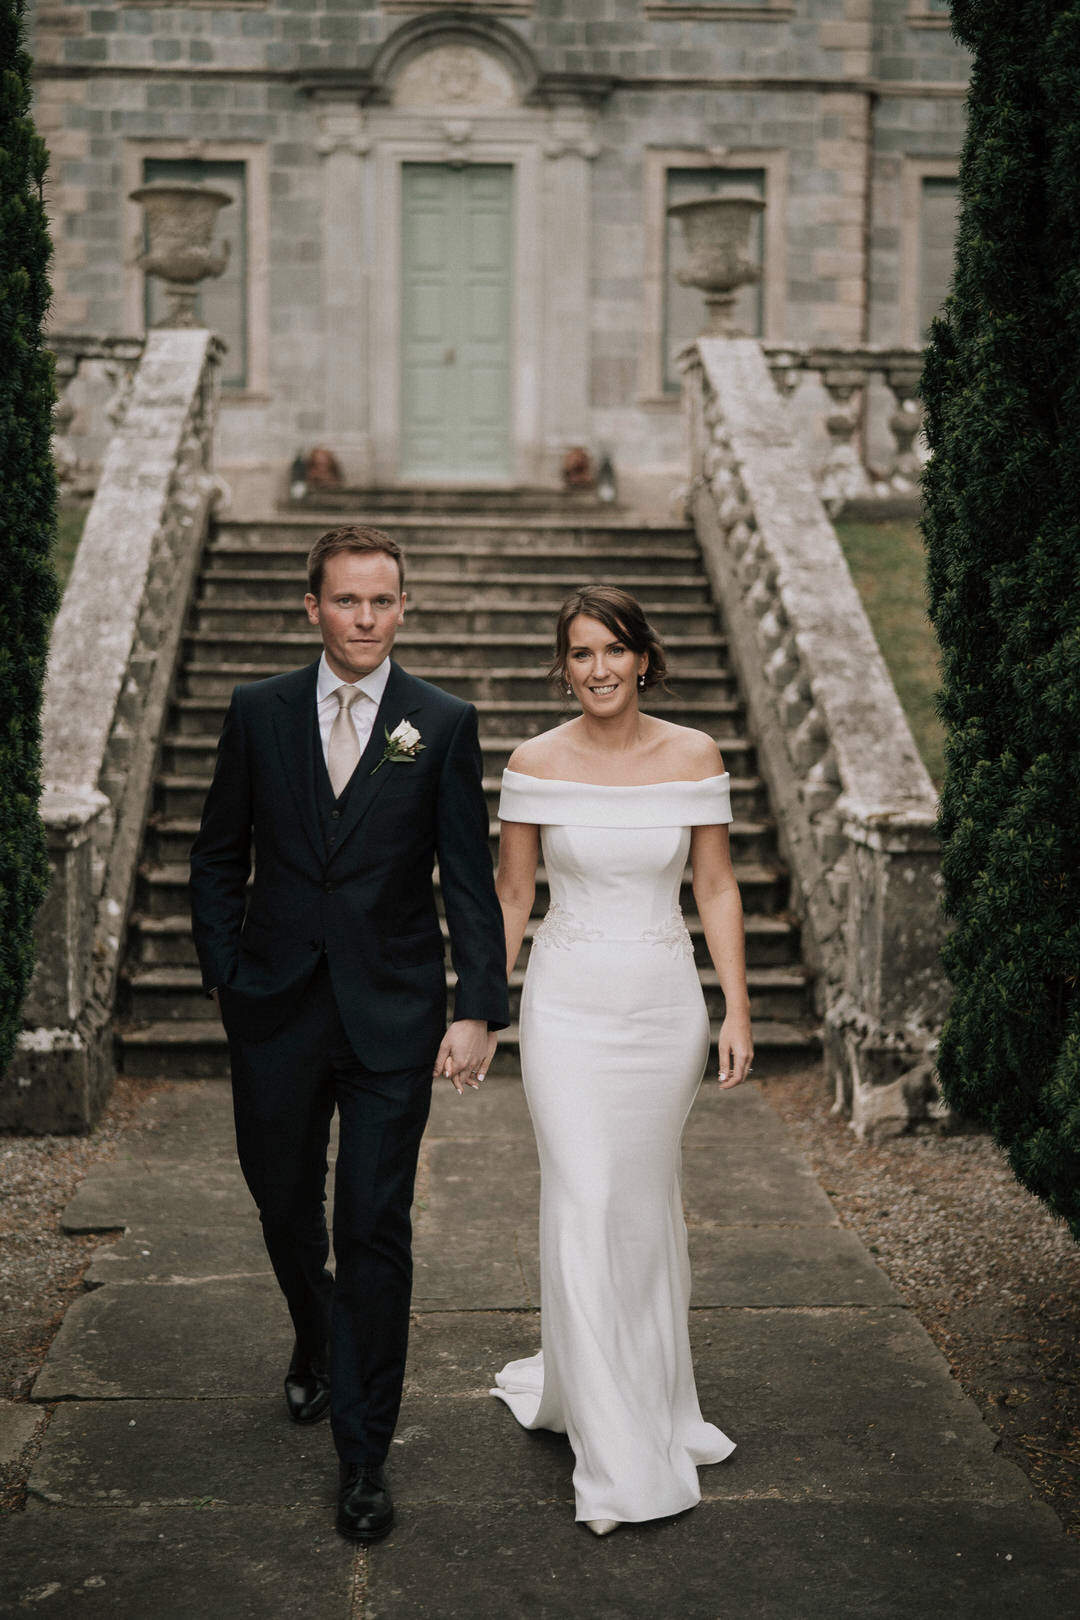 Gloster-House-wedding-photos10 10